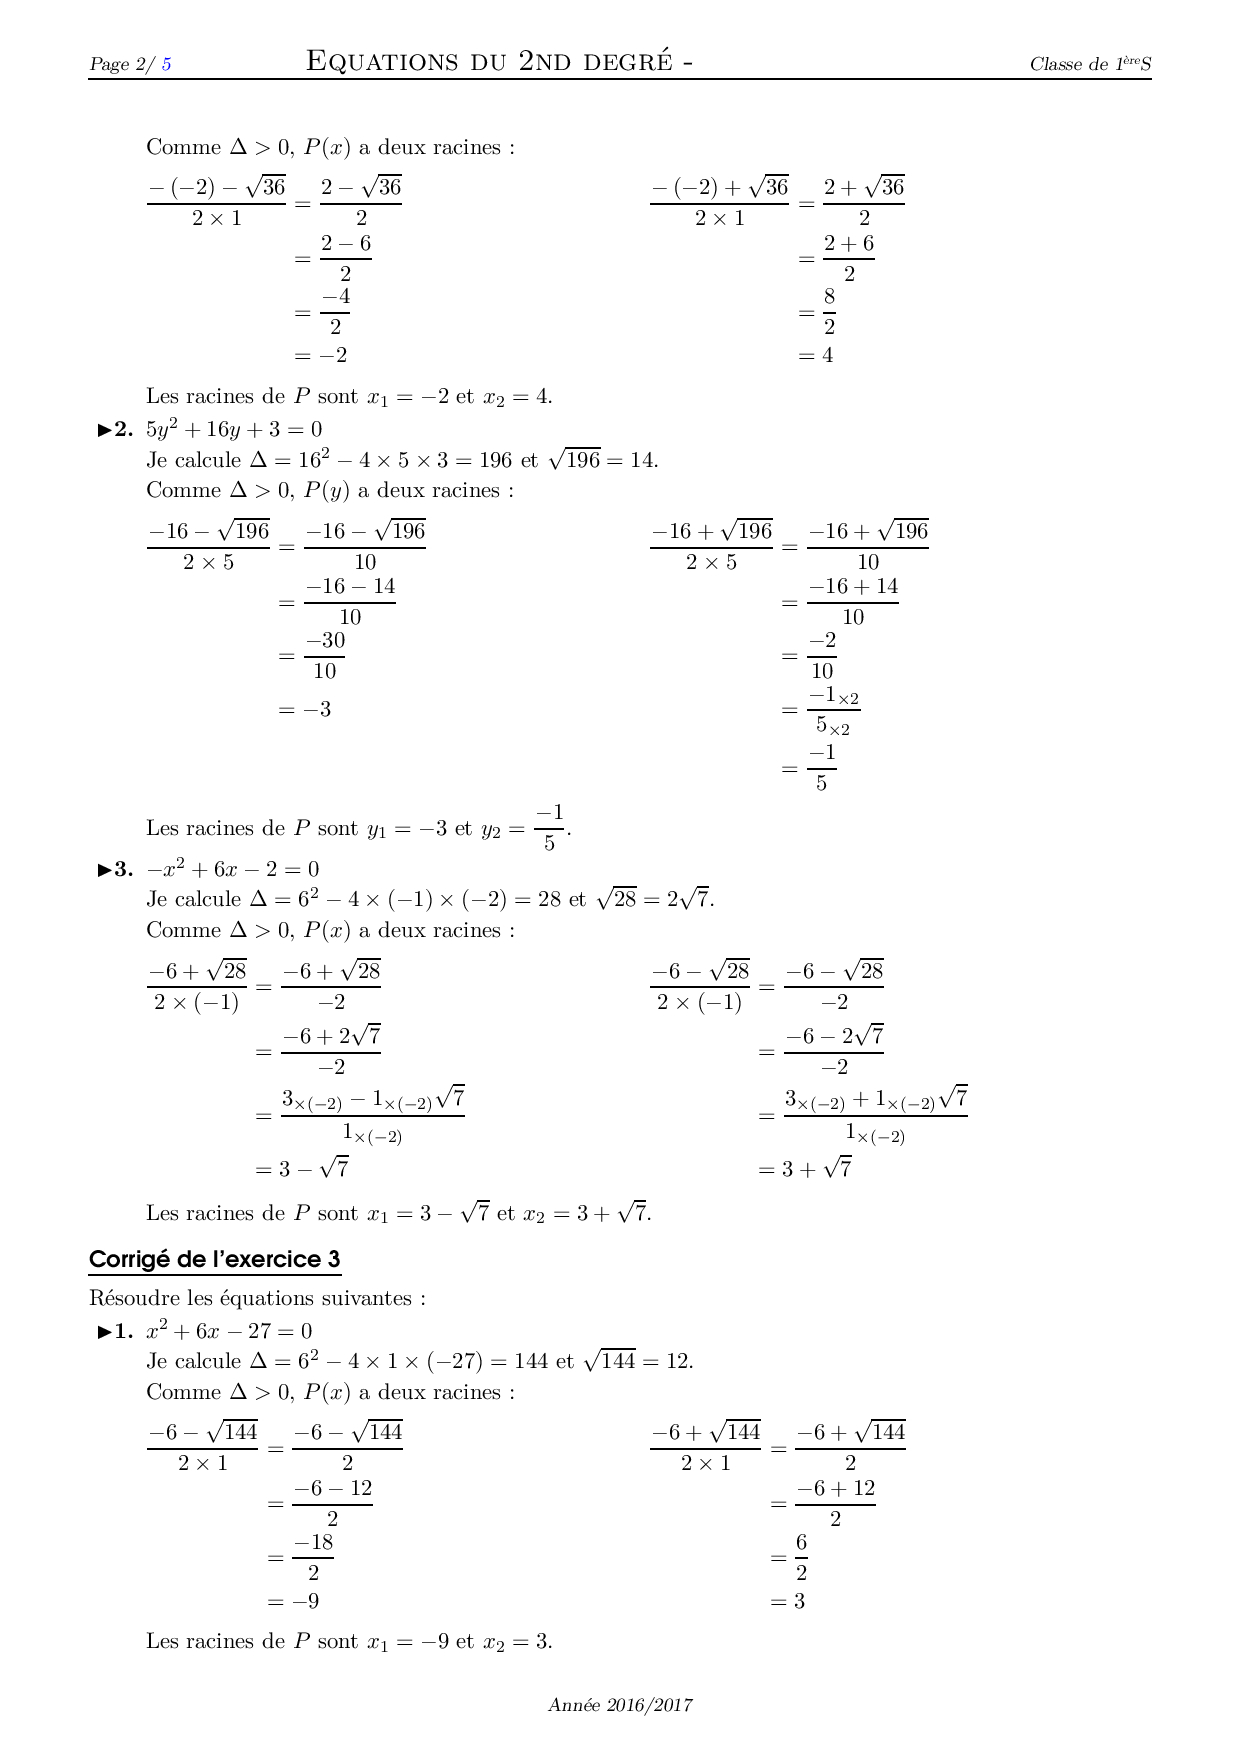 Resoudre Une Equation Du Second Degre Corrige Serie D Exercices 3 Alloschool